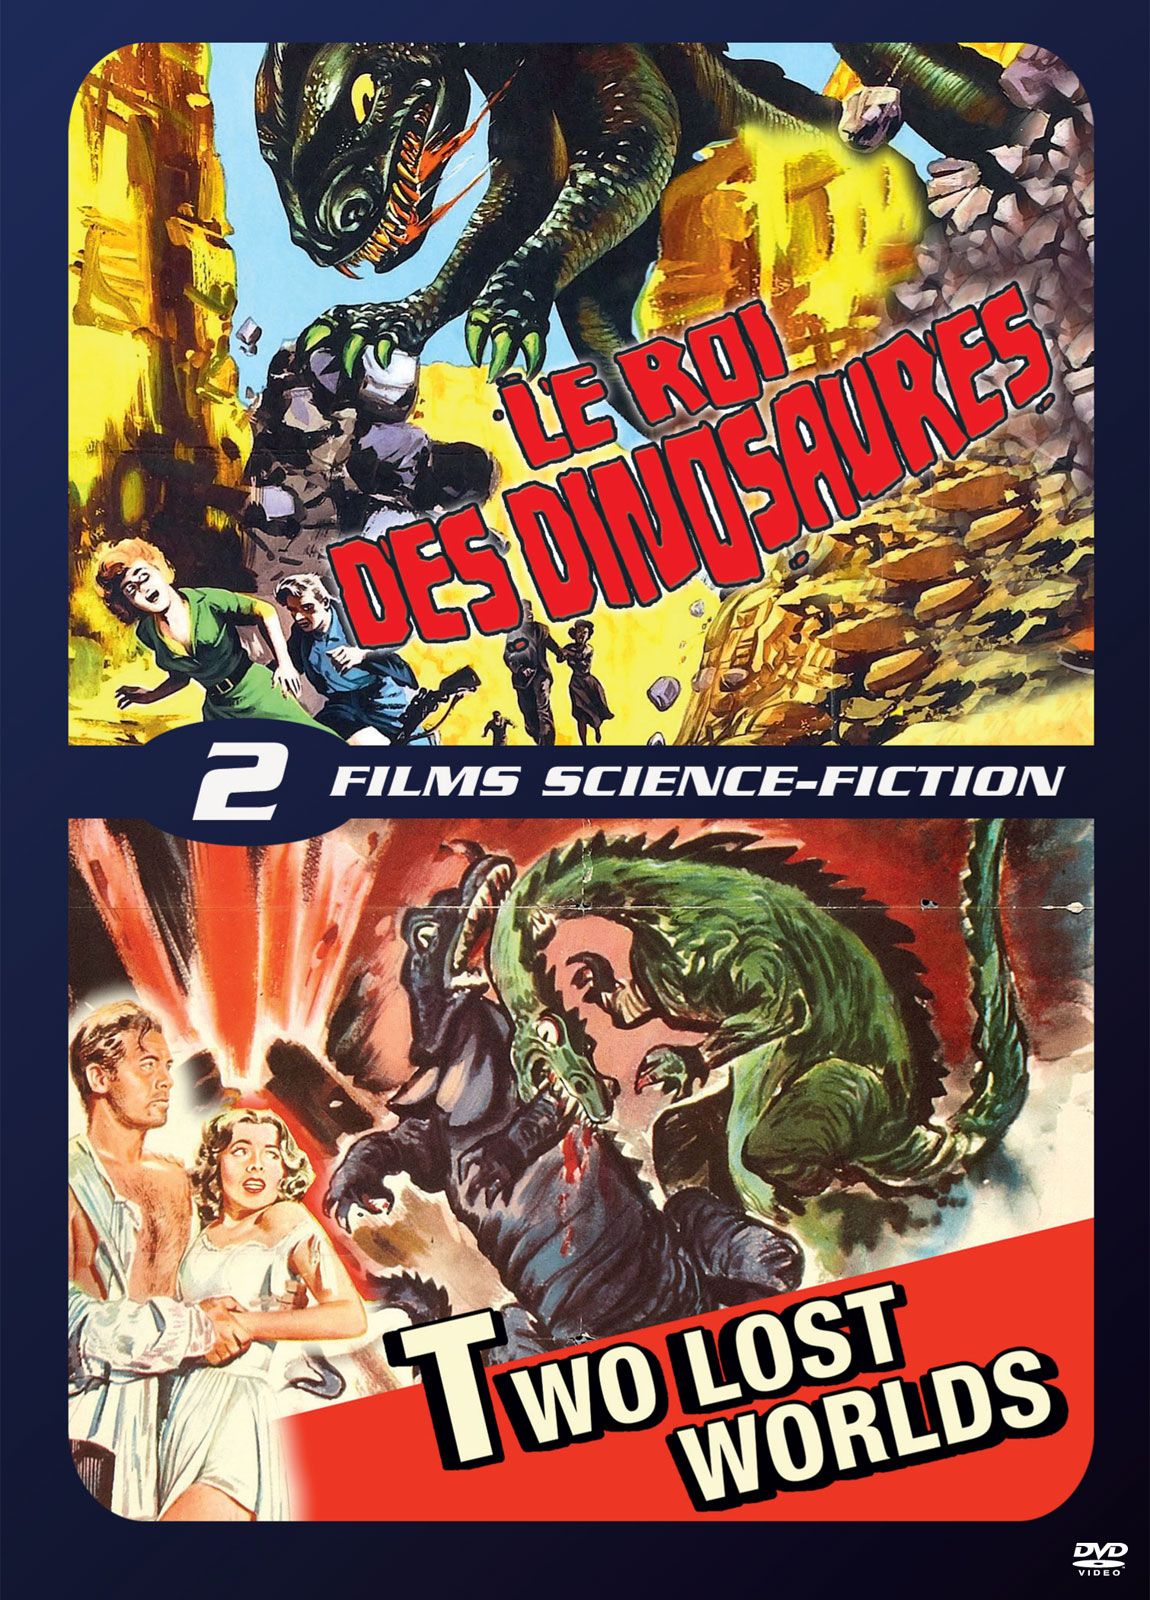 two lost worlds film 1951 allocin. Black Bedroom Furniture Sets. Home Design Ideas